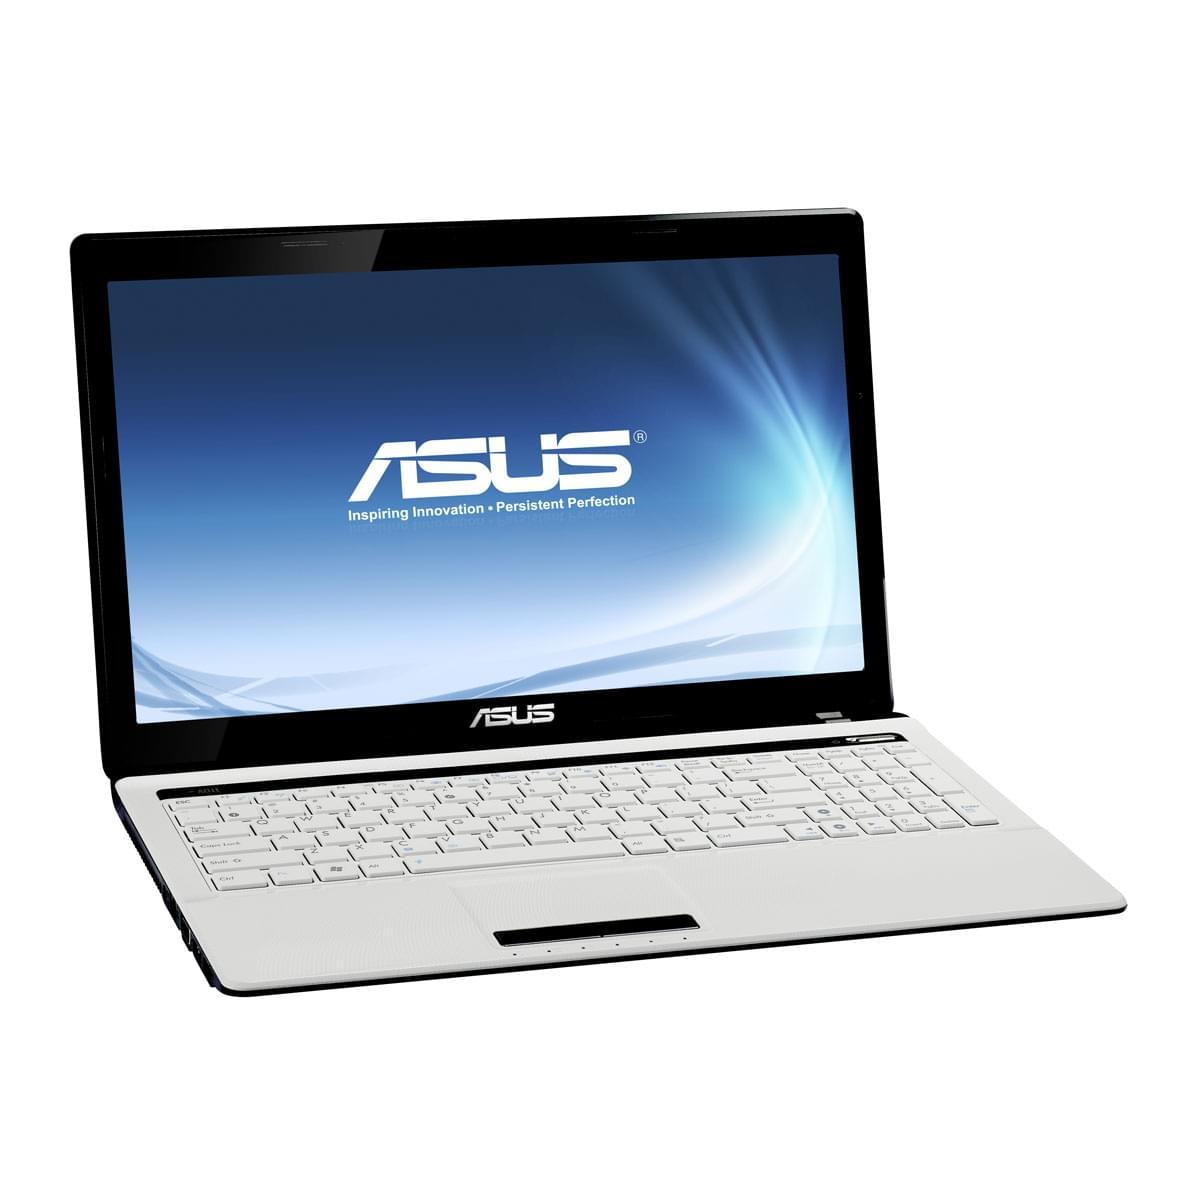 Asus K53SD-SX1278V (K53SD-SX1278V obso) - Achat / Vente PC portable sur Cybertek.fr - 0